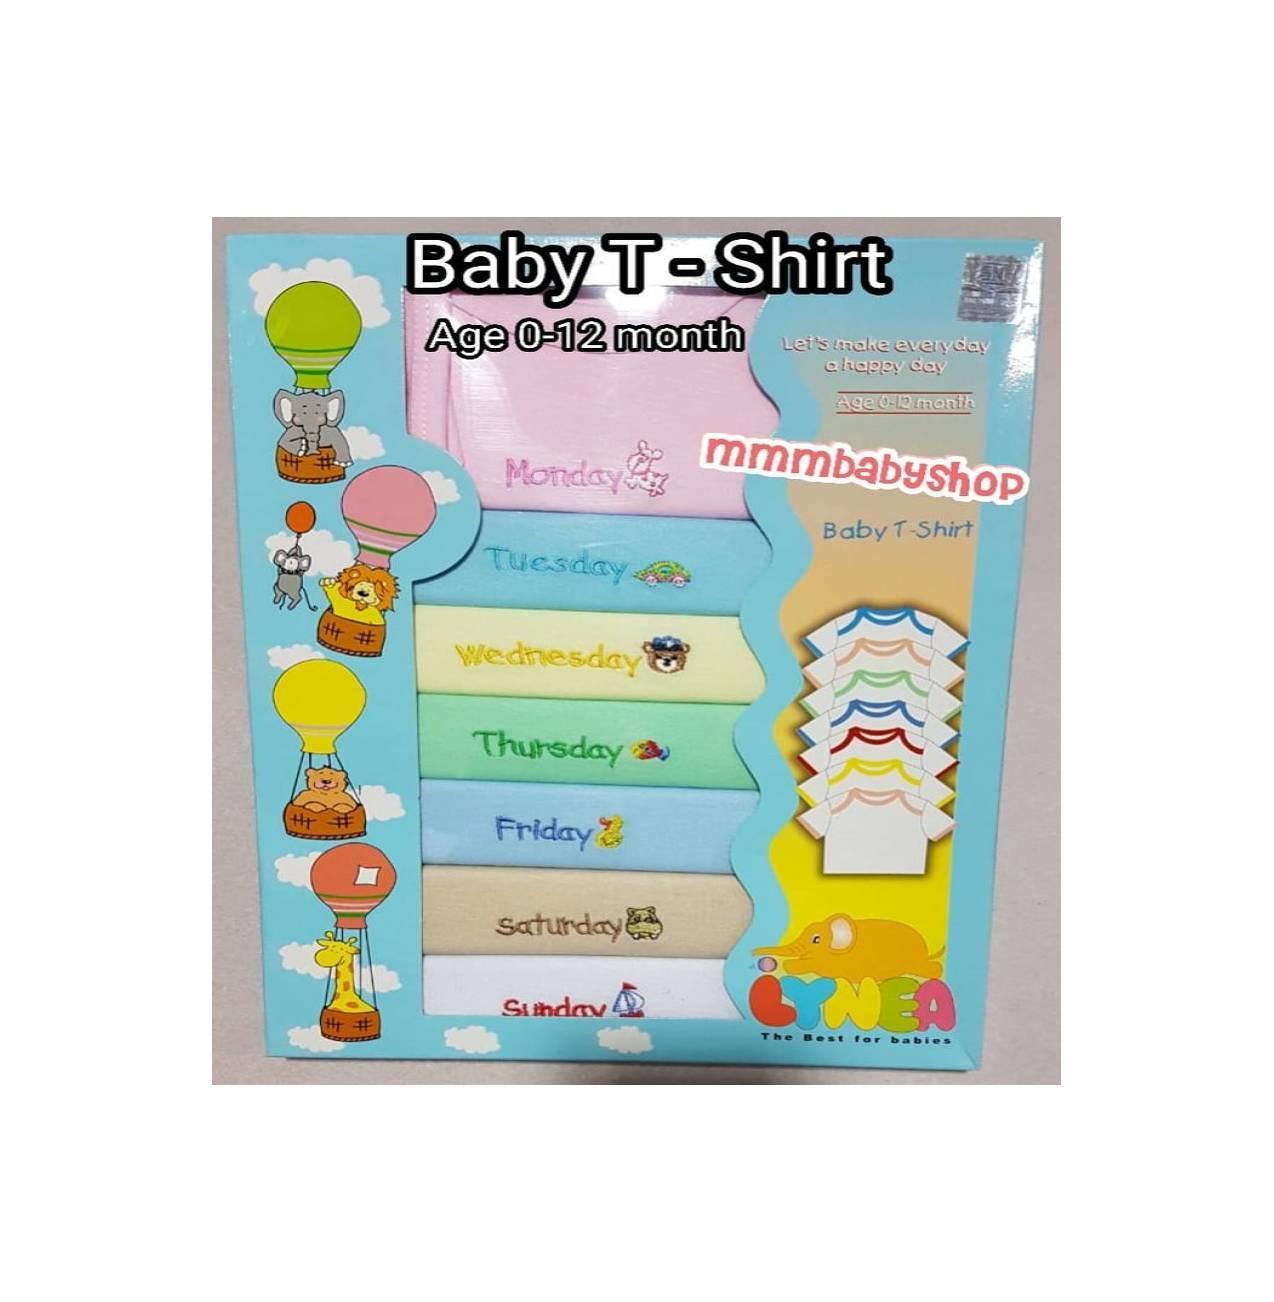 LYNEA Baju Set Bayi Baby T Shirt Kaos Bayi SNI Good Quali T30